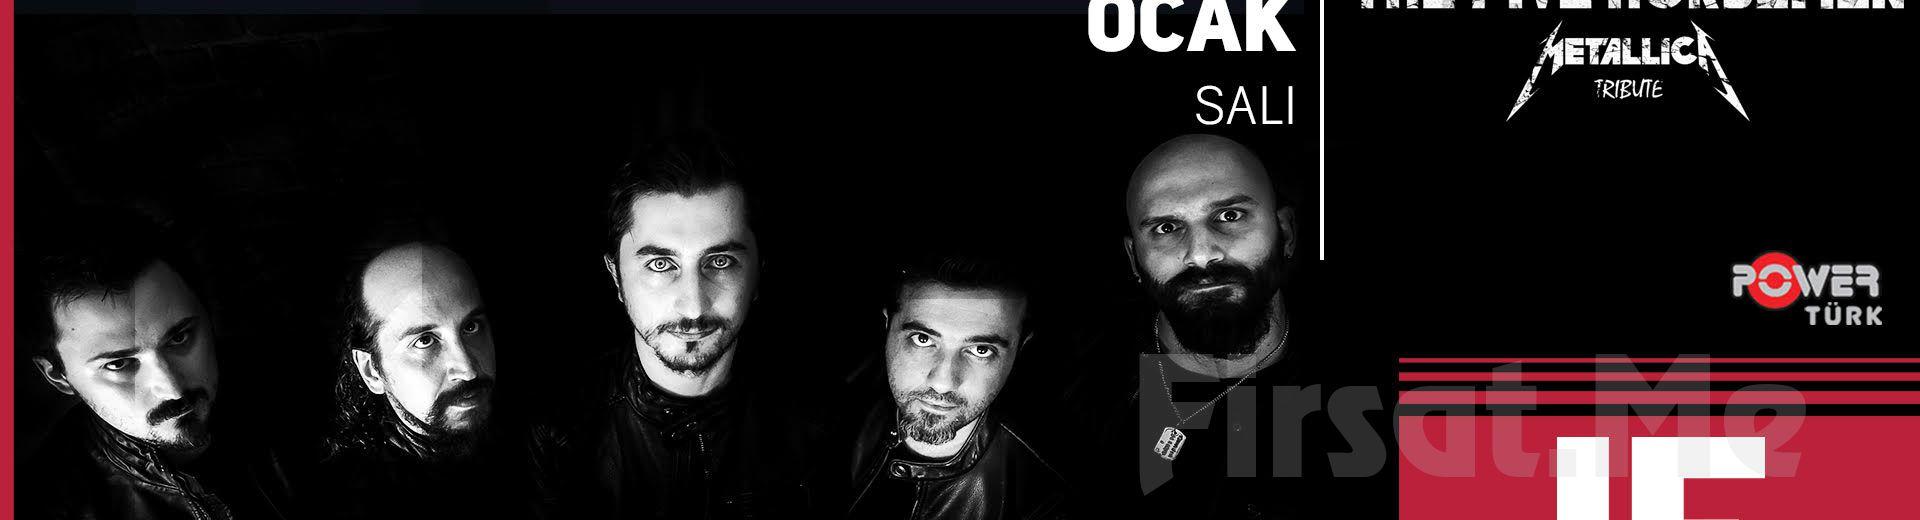 IF Performance Beşiktaş'ta 29 Ocak'ta 'The Five Horsemen - Metallica Tribute' Konser Bileti